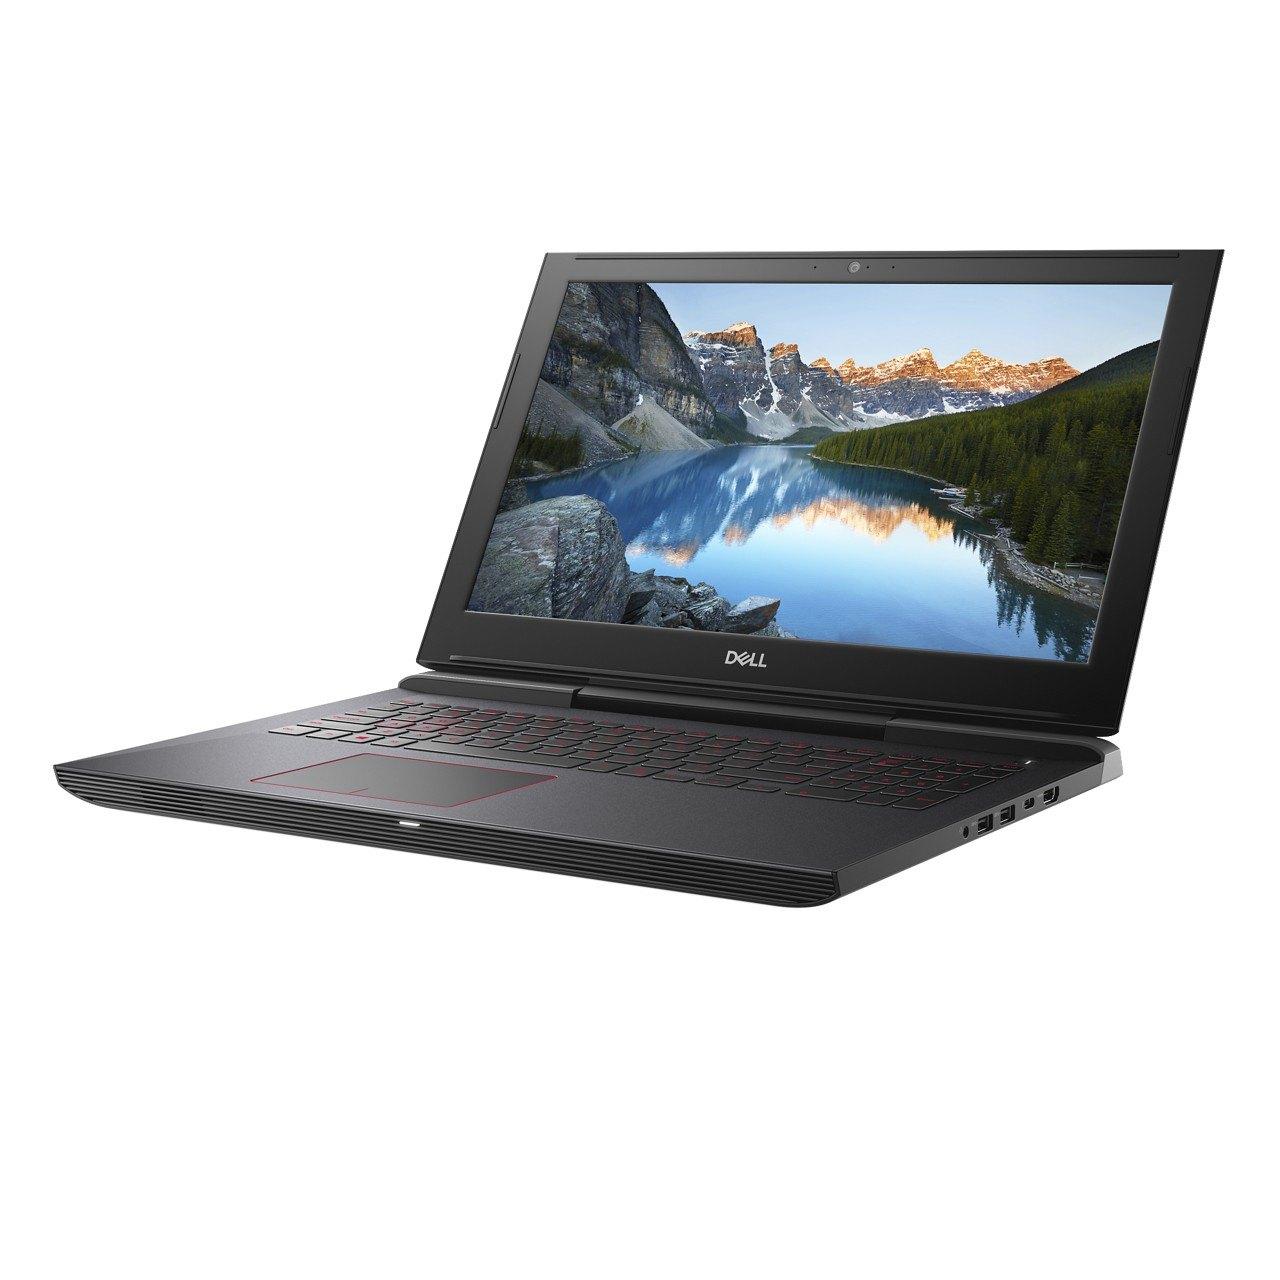 Dell Inspiron 15 7000 Gaming Laptop - GTX 1060 - I5 - 128GB SSD + 1TB HDD - 8GB RAM: $799.99 AC + Free Shipping